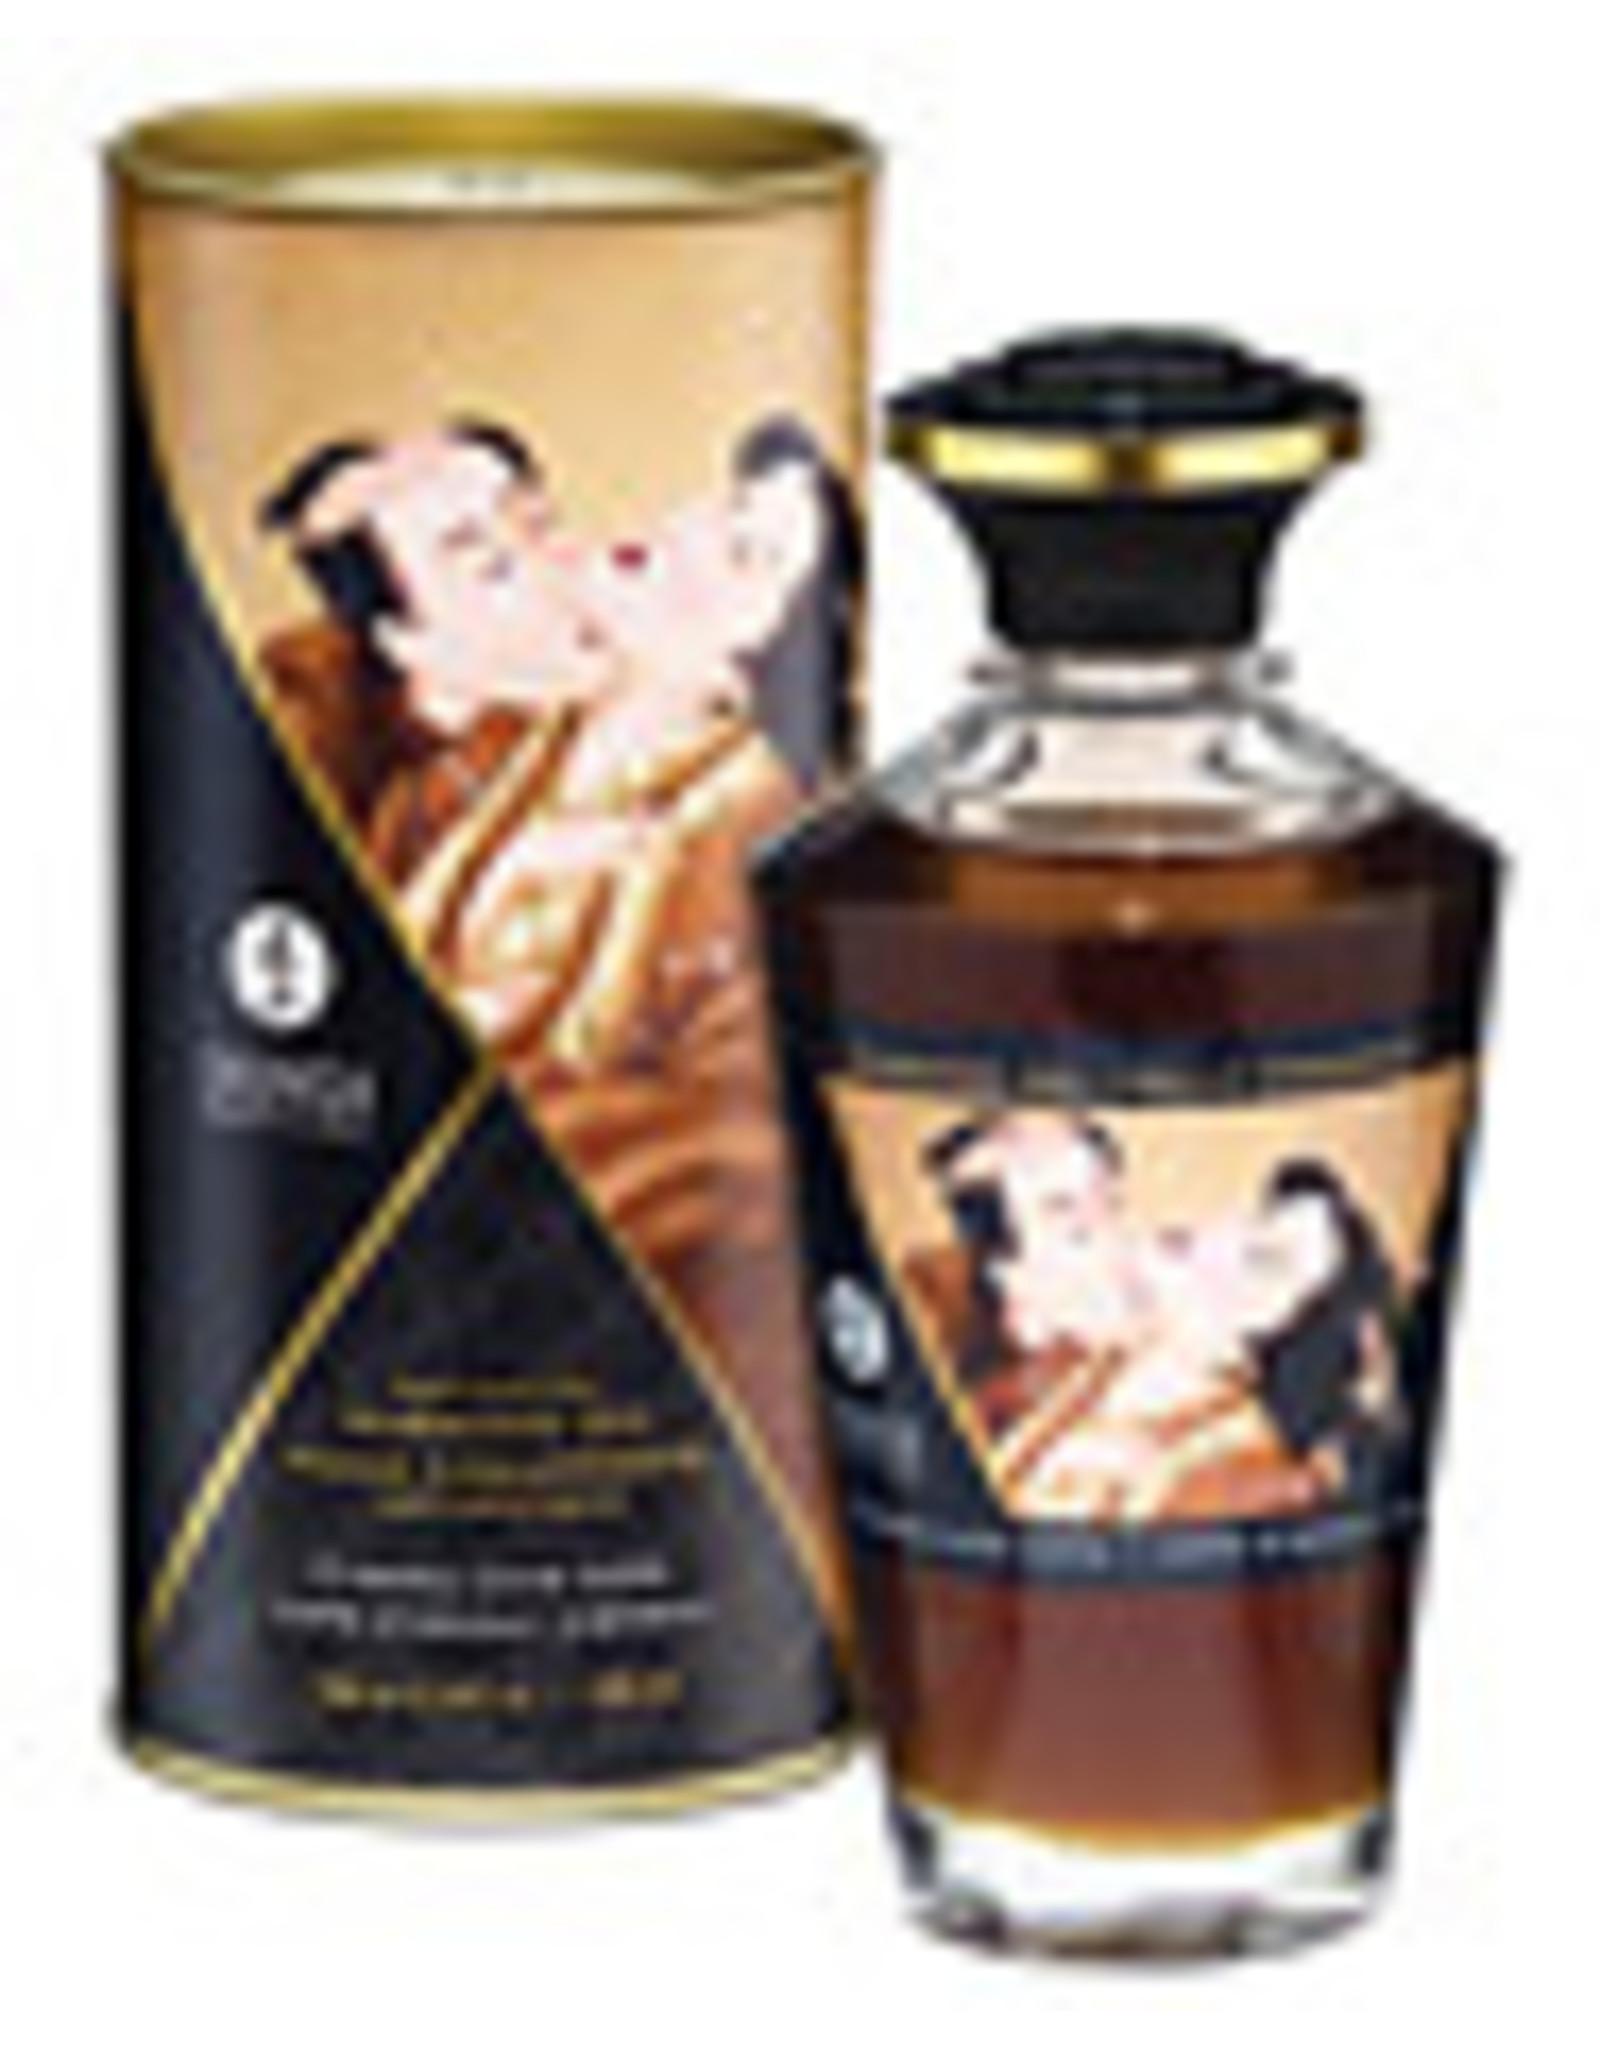 Shunga Warming Oil 3.5oz Creamy Love Latte